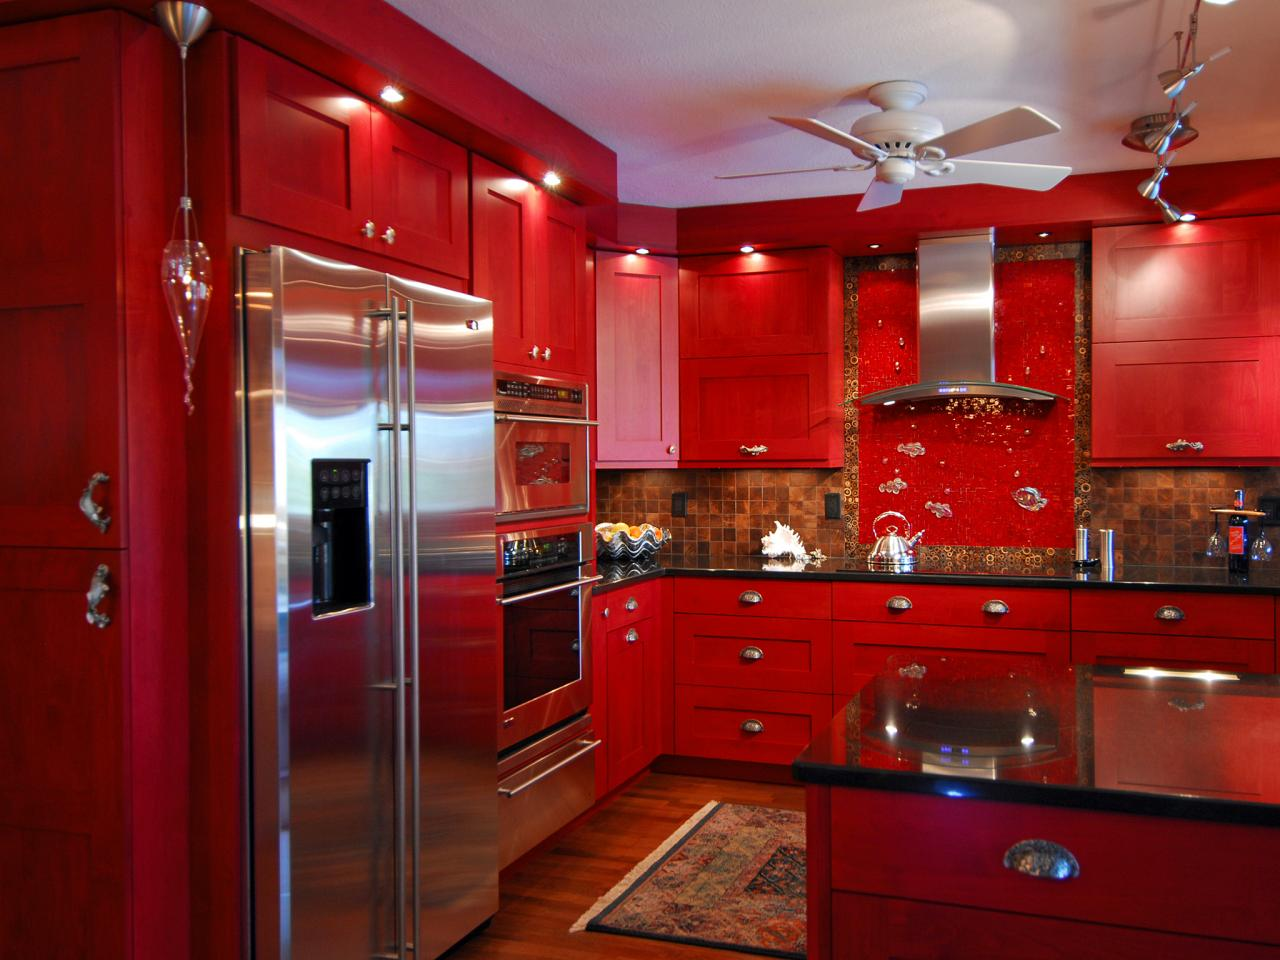 original_john-ryba-armoires-de-cuisine-rouges-jpg-rend-hgtvcom-1280-960